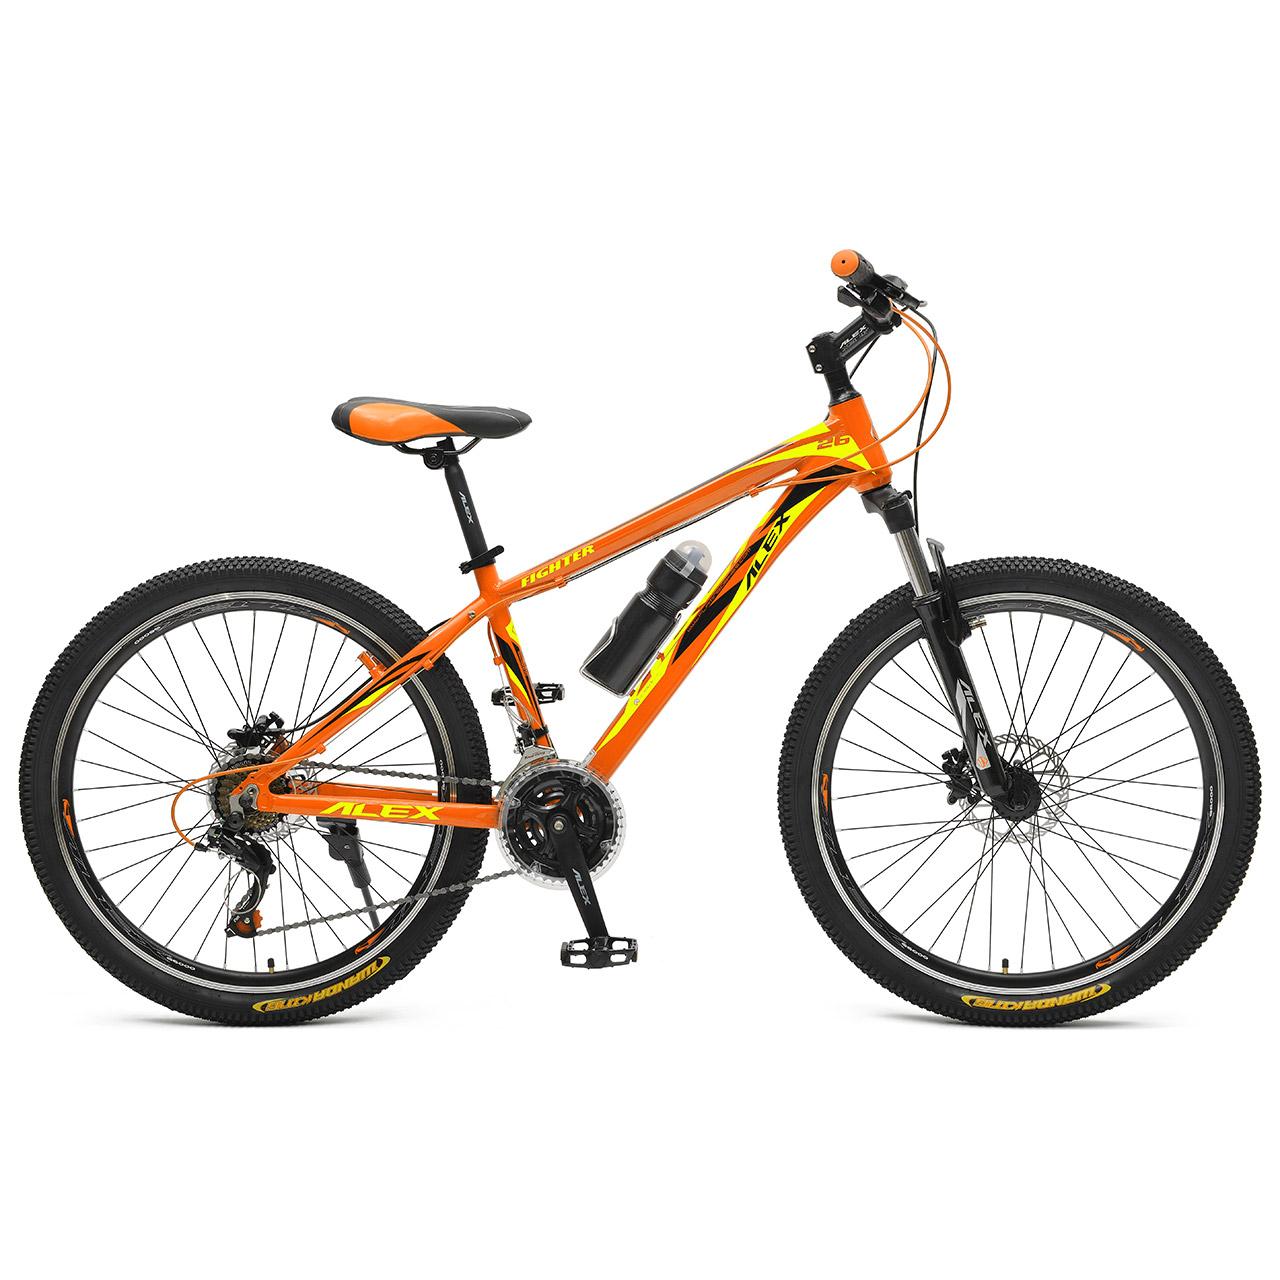 دوچرخه کوهستان الکس مدل Fighter سایز 26